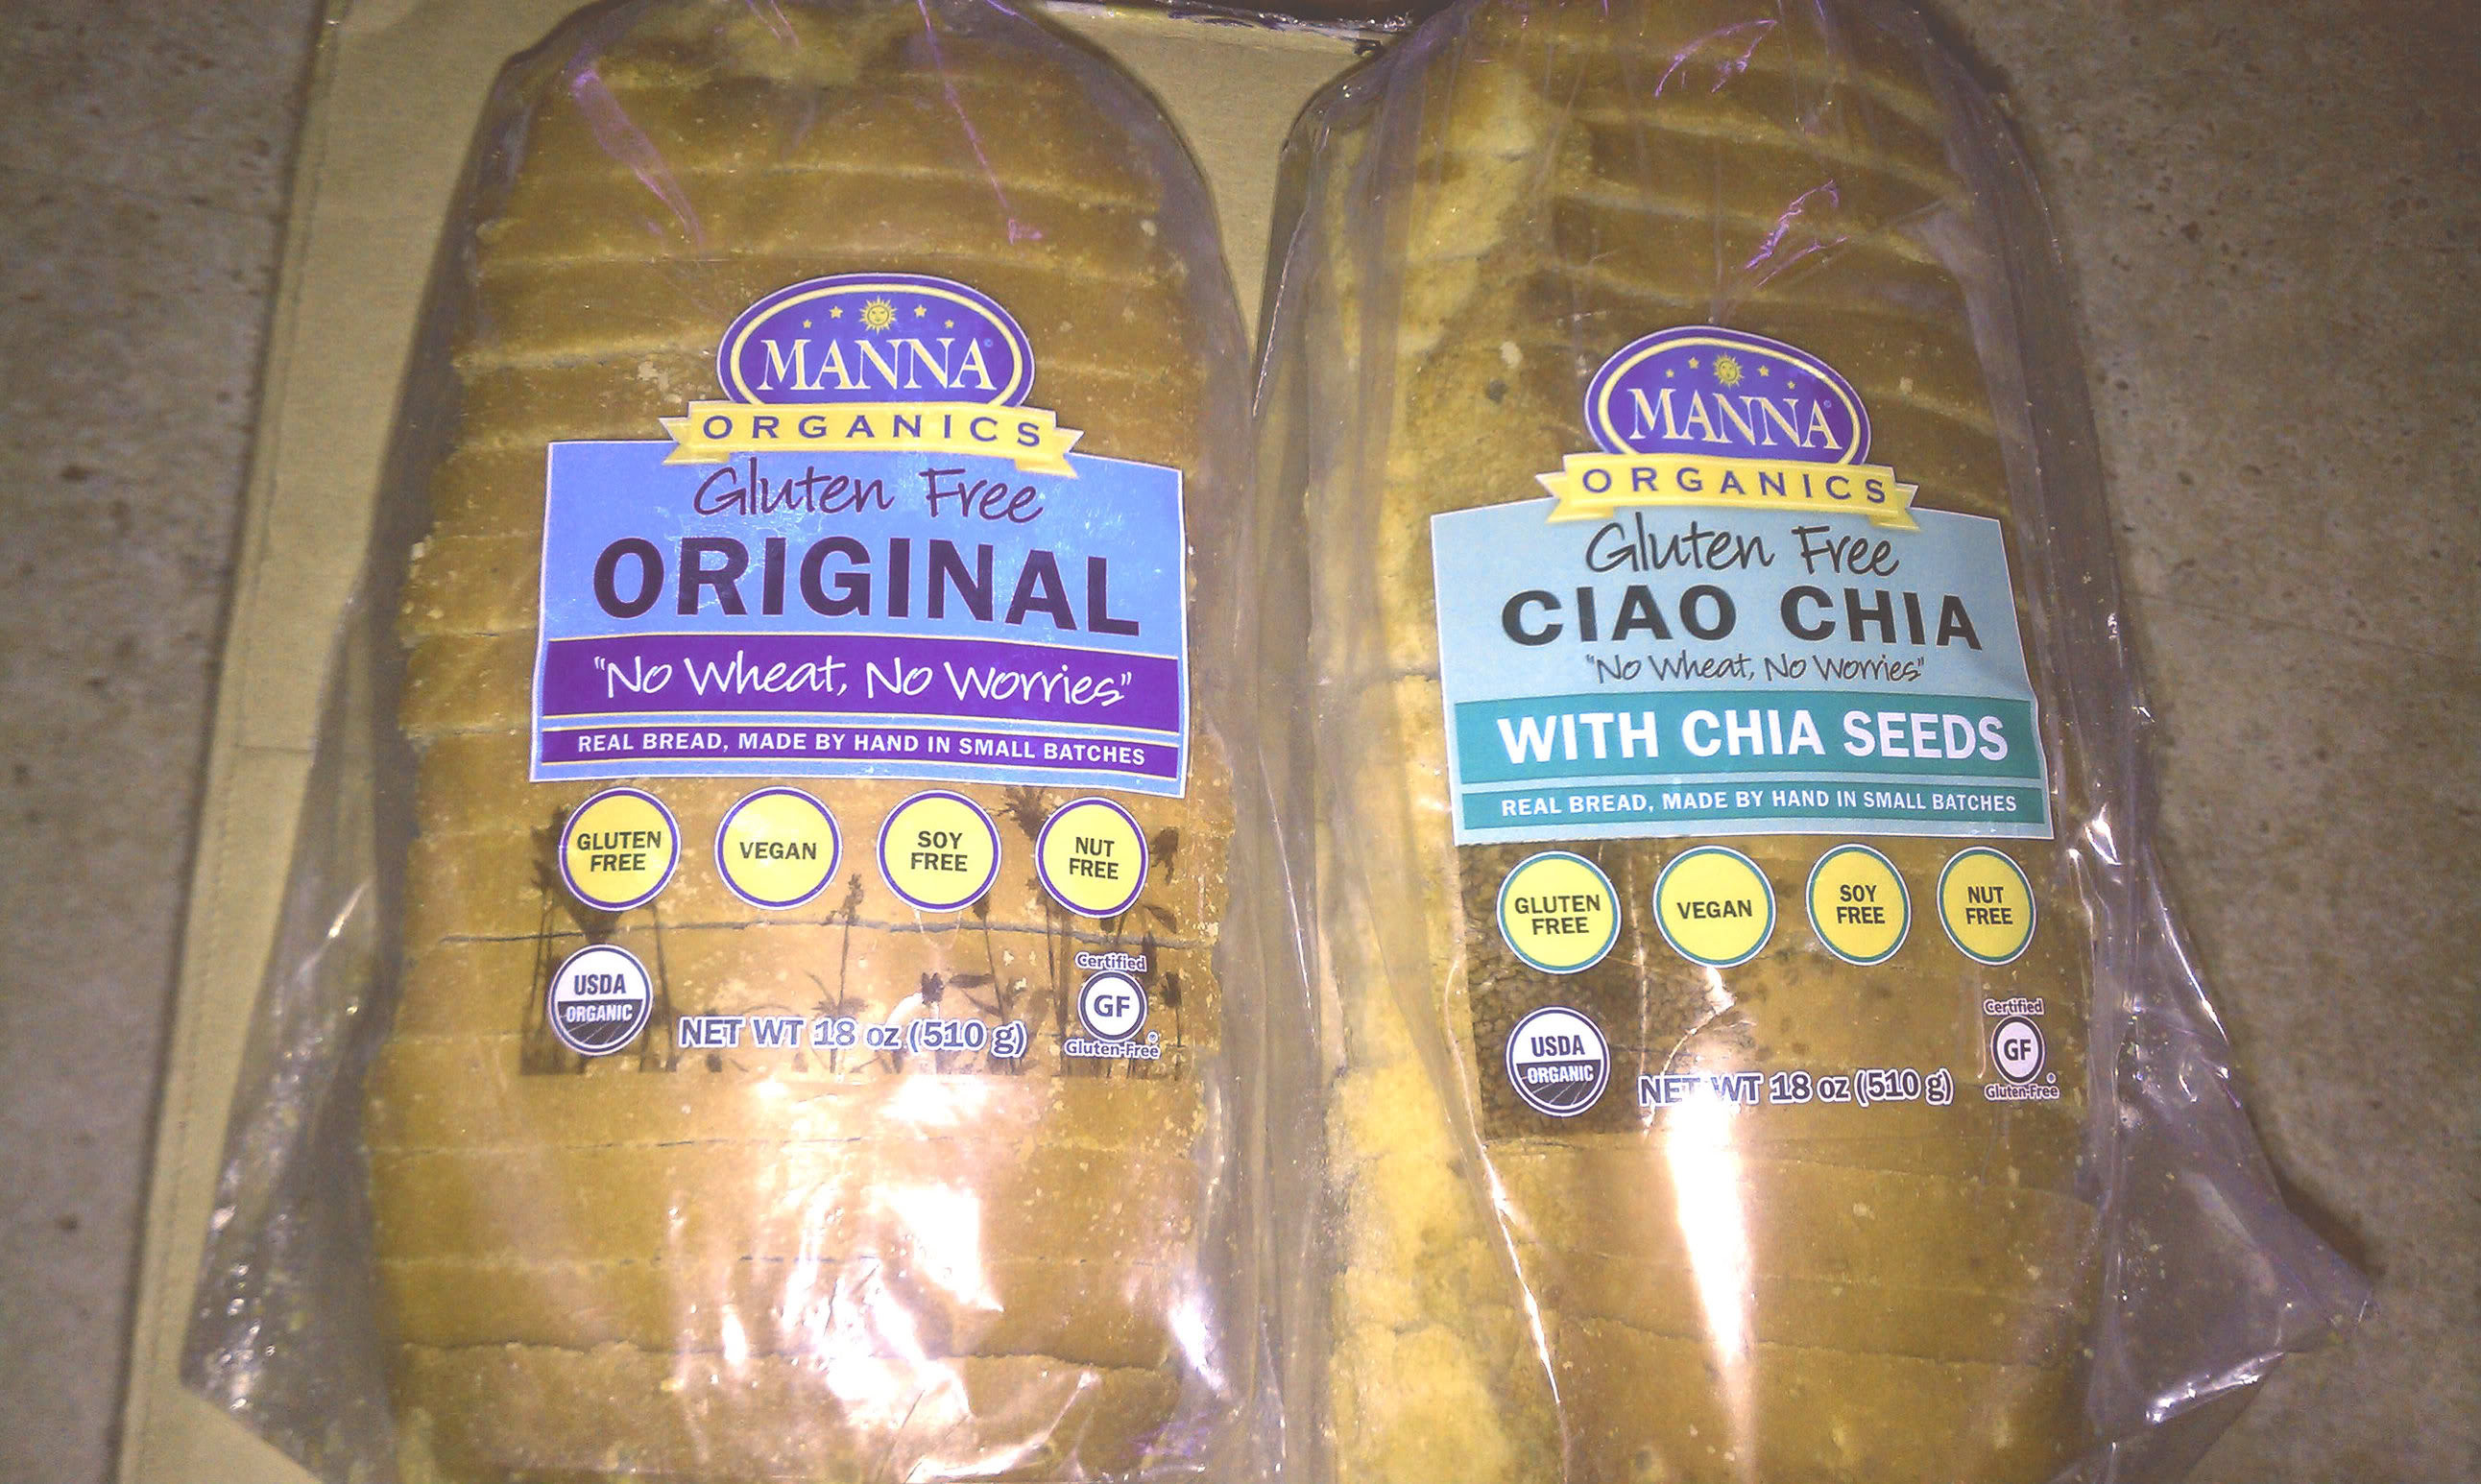 Organic Gluten Free Bread  Organic Natural & Gluten Free Breads from Manna Organics